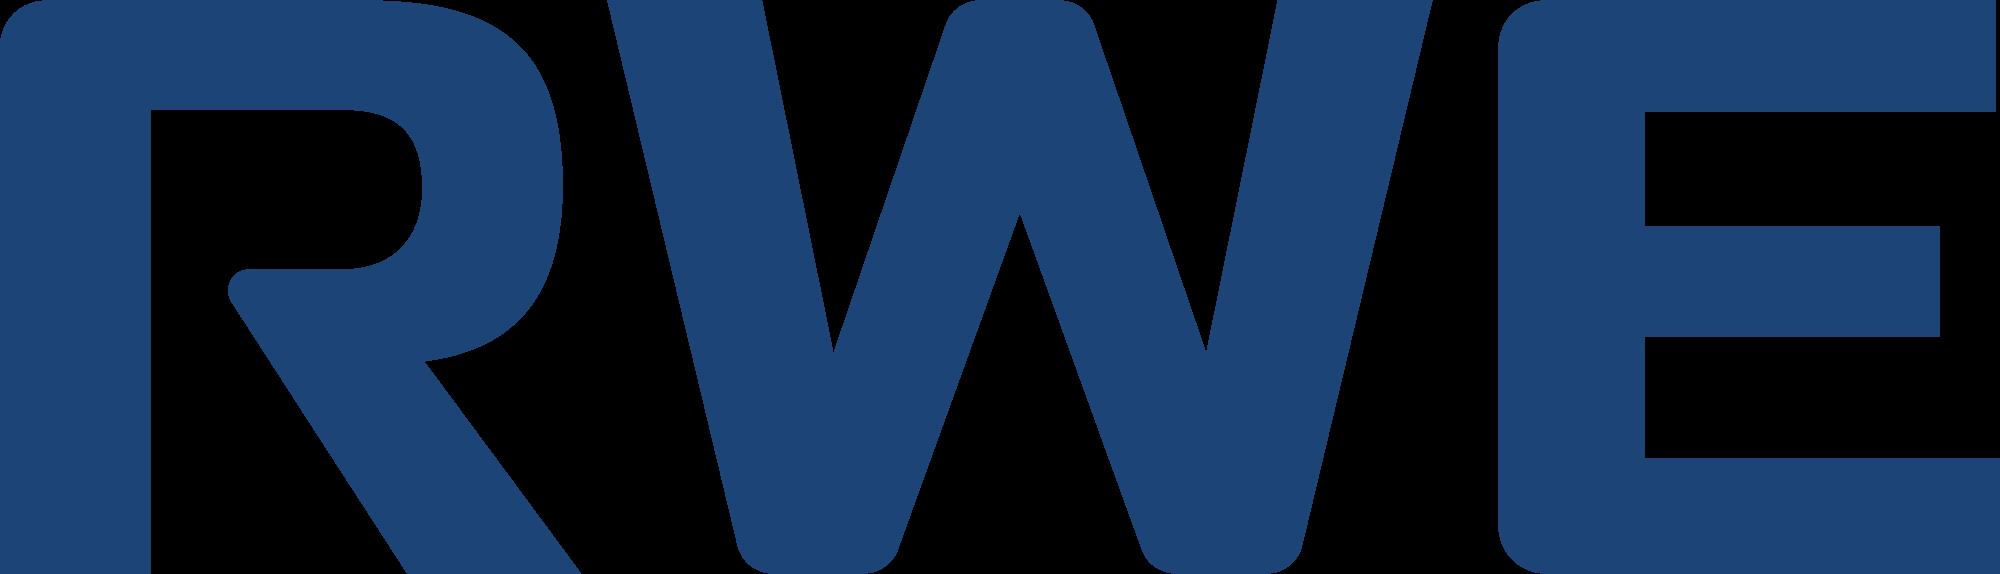 RWE logo blue RGB